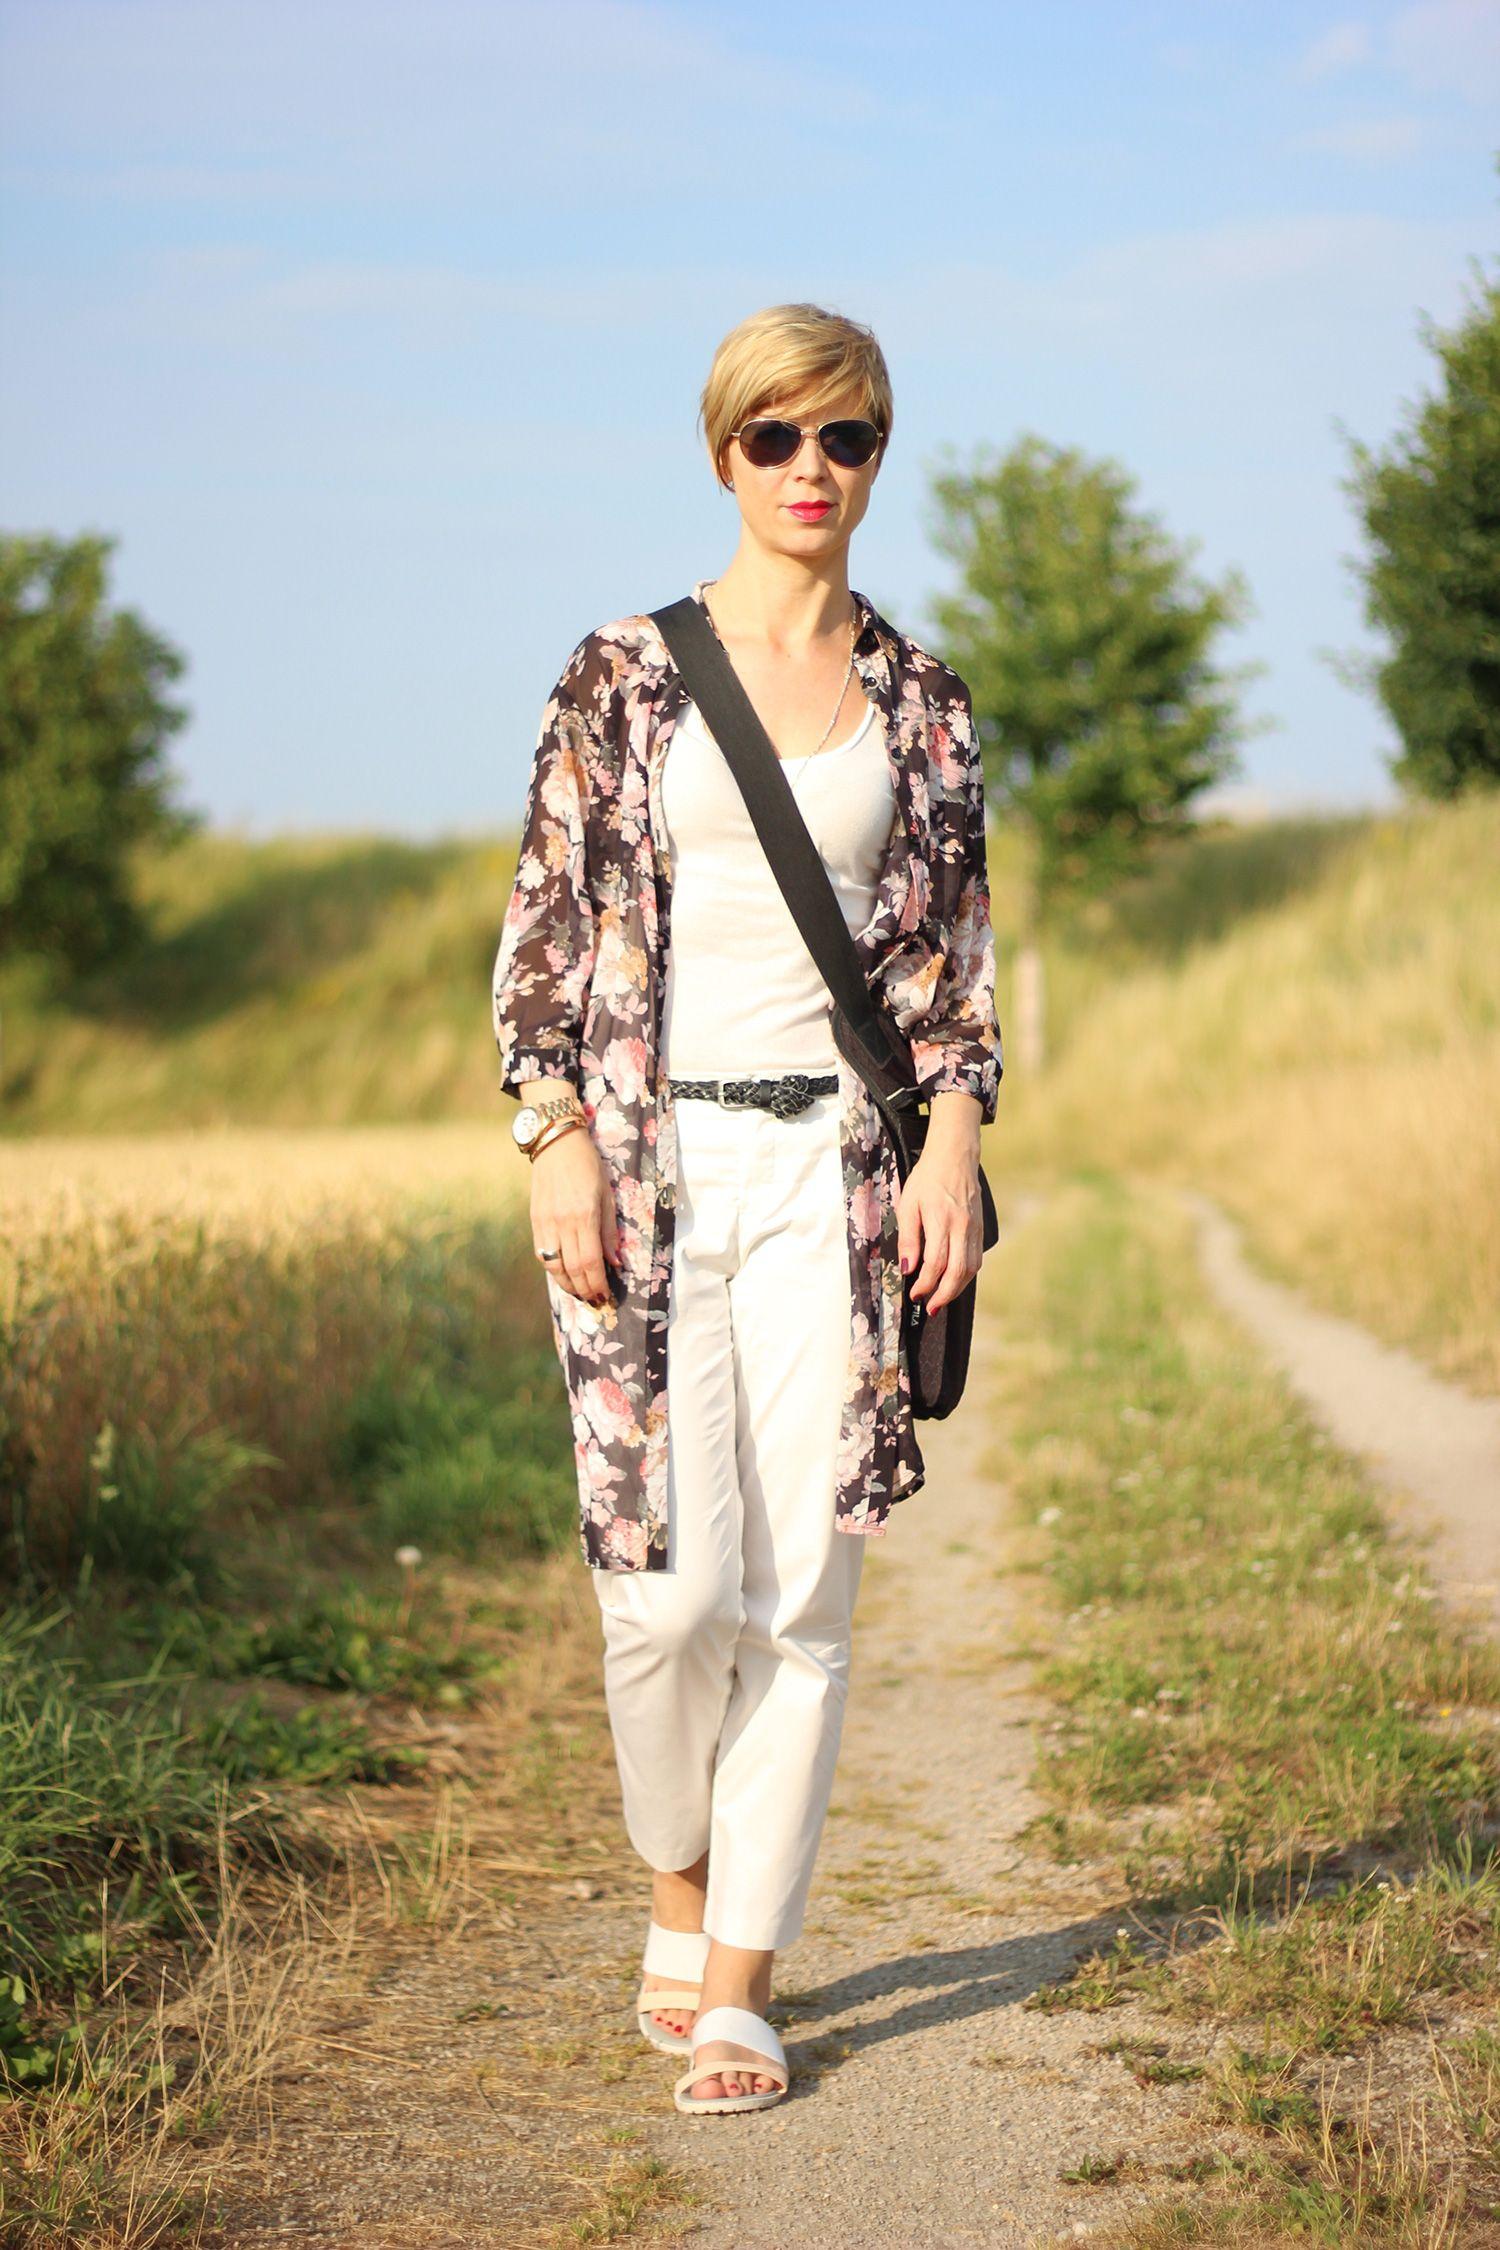 IMG_7962aLongbluse_Blumen_flowers_weisseHose_whitepants_oui_top_summer_fashion_aheamdundahos_conny_crossbodybag